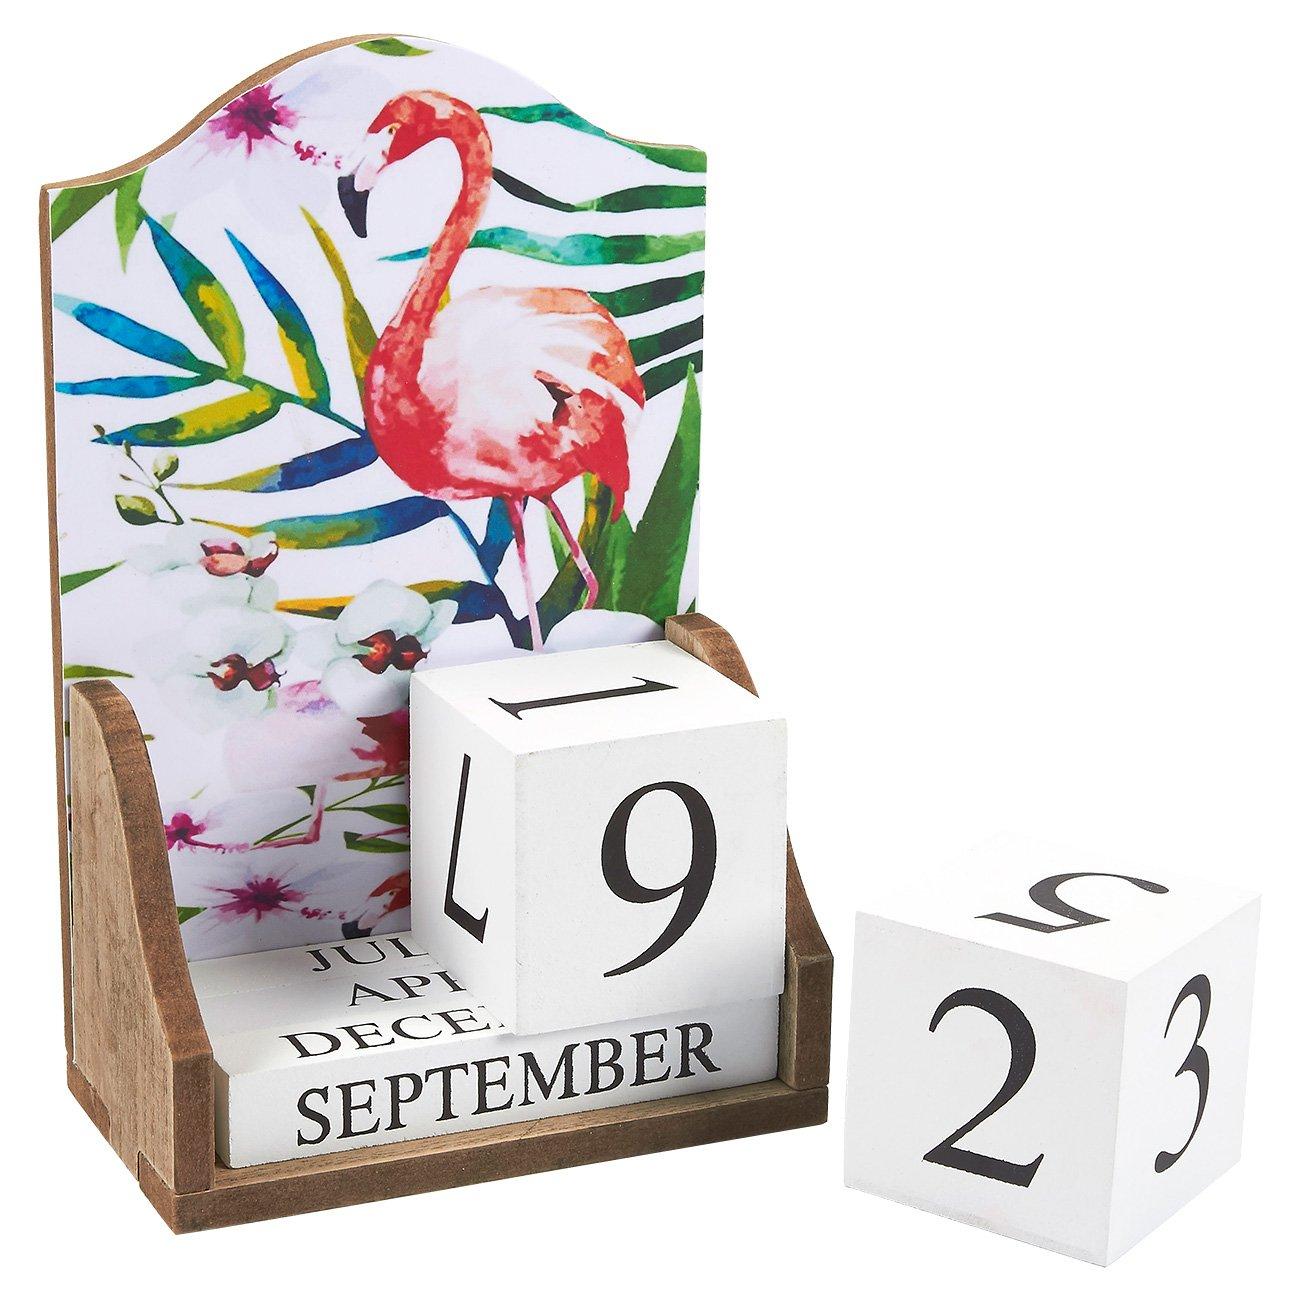 Wooden Desk Calendar - Wooden Block Perpetual Calendar for Home and Office Desk Decor, Flamingo Design, 5.5 x 8.75 x 3 inches